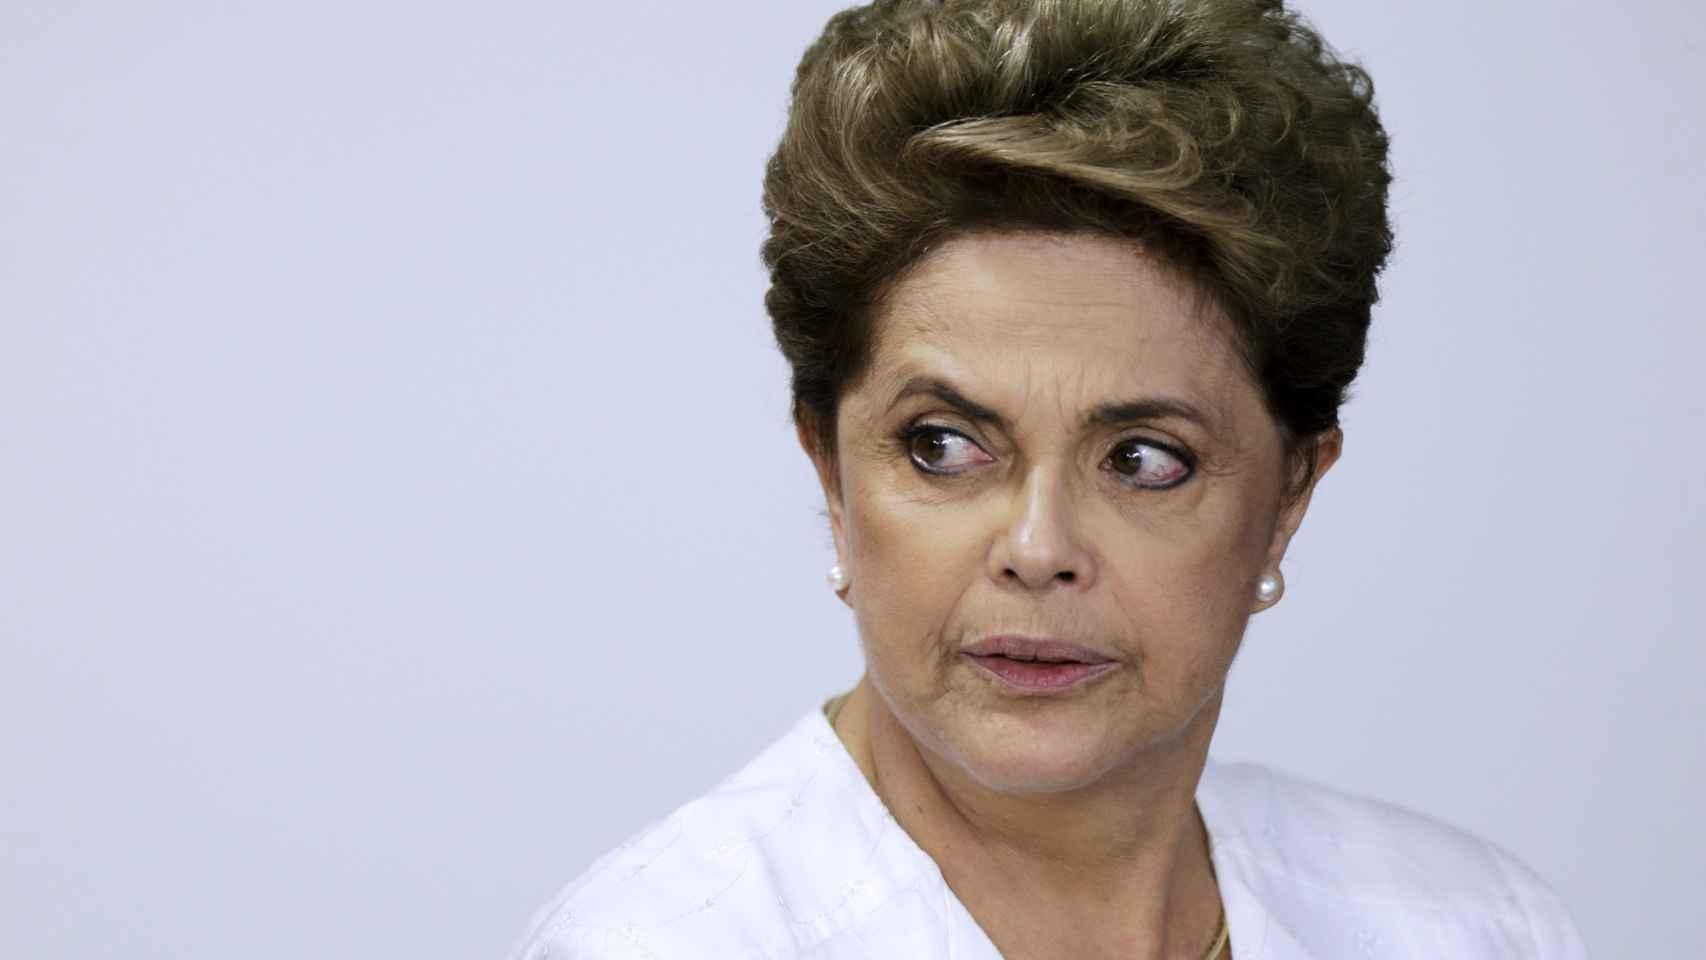 La presidenta de Brasil, Dilma Rousseff, en una imagen reciente.